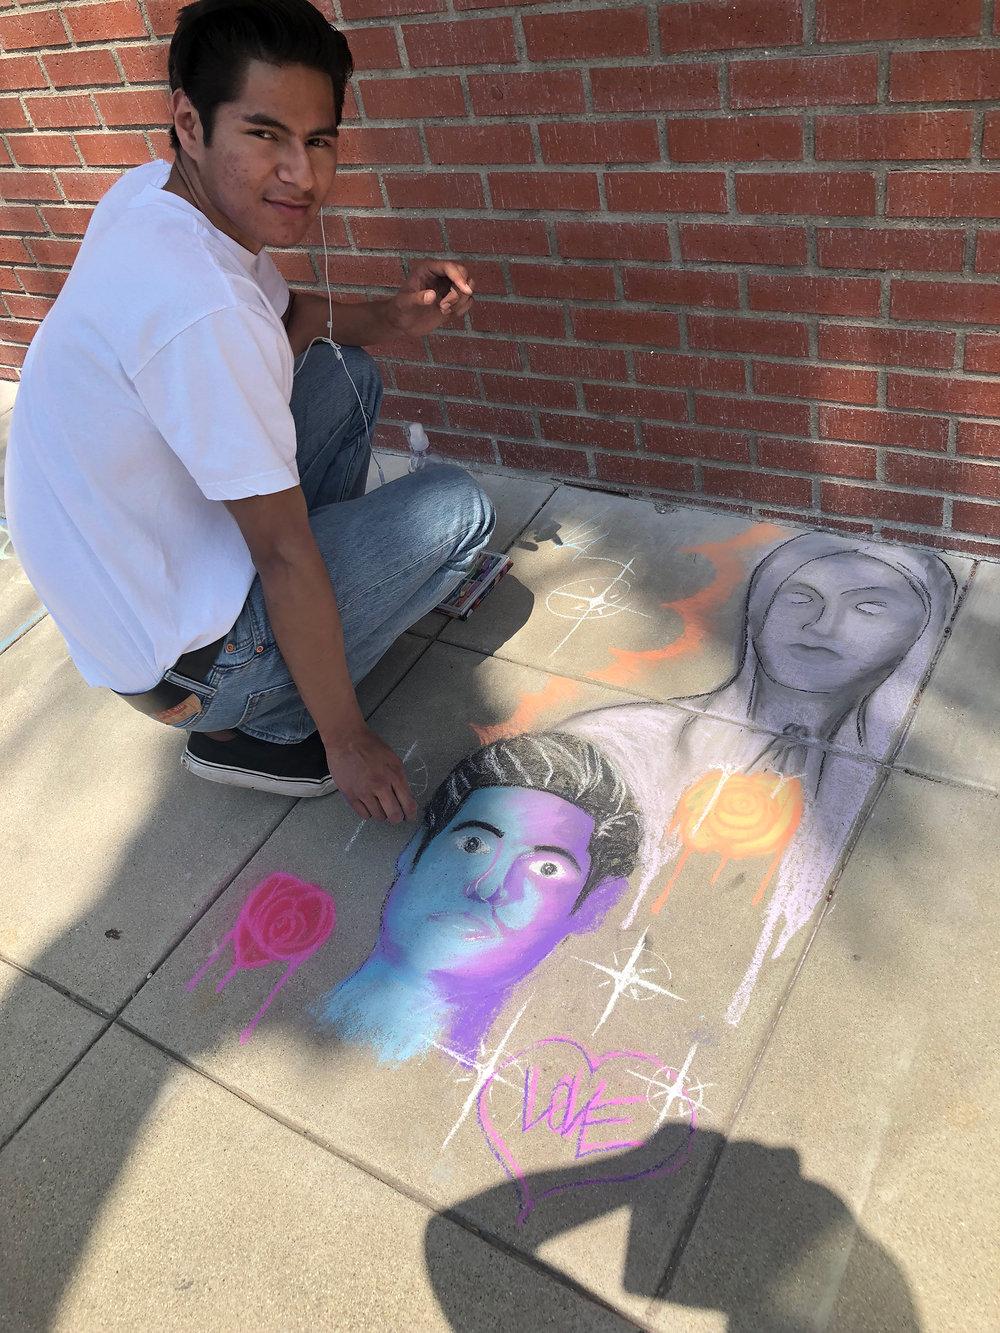 chalk-art-0743.jpg